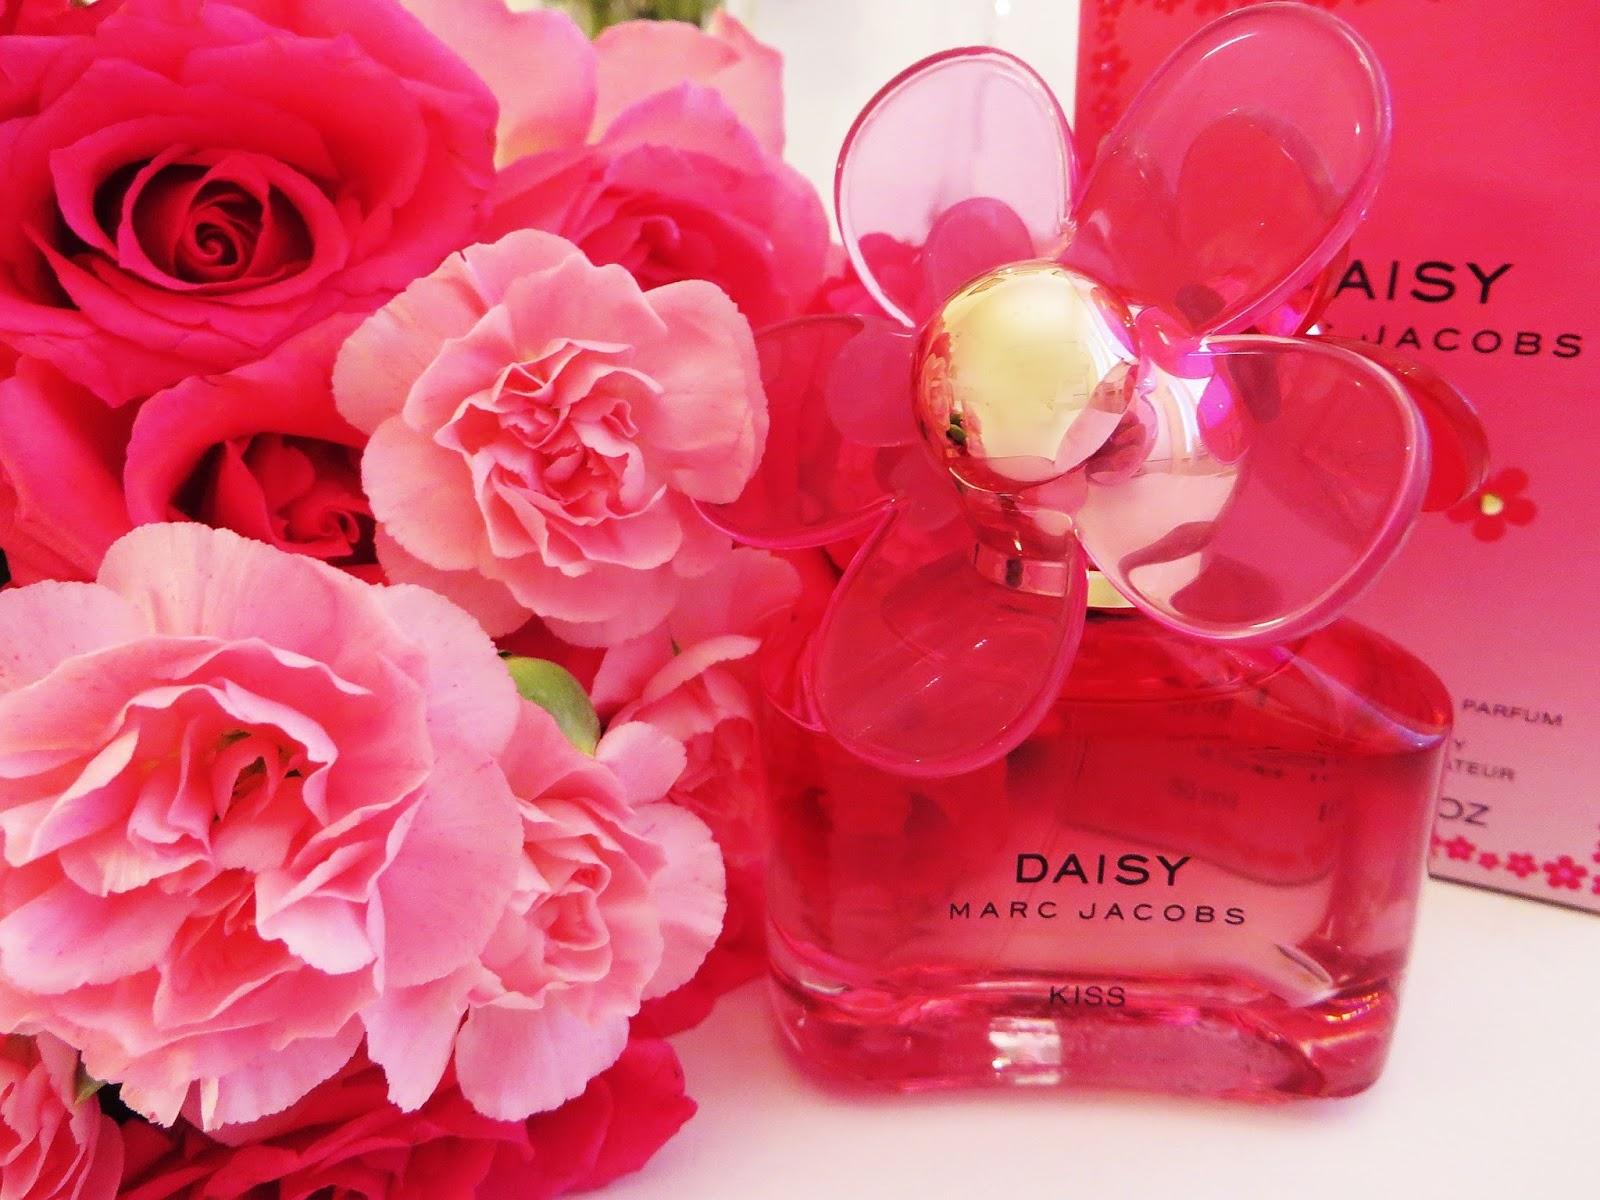 Marc Jacobs Daisy Kiss, Marc Jacobs tuoksut, kesätuoksut, kesätuoksu, Daisy Kiss